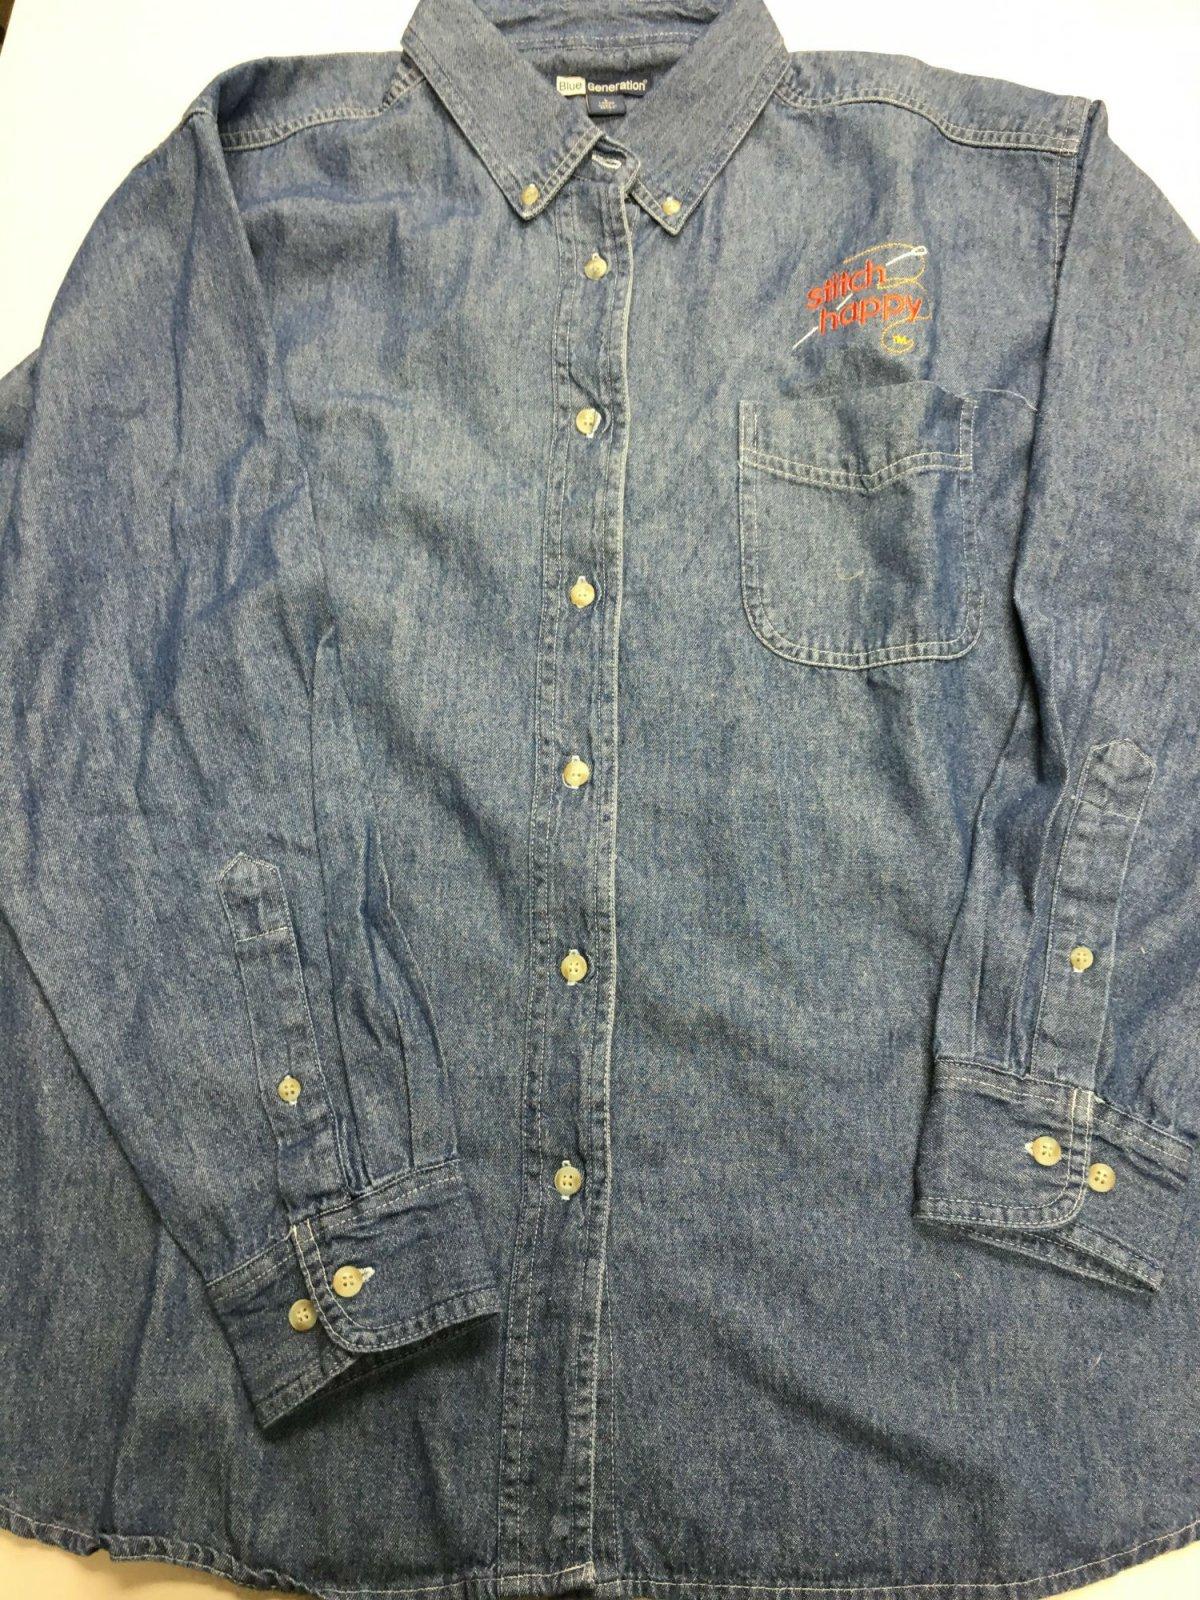 Stitch Happy denim shirt 2XL